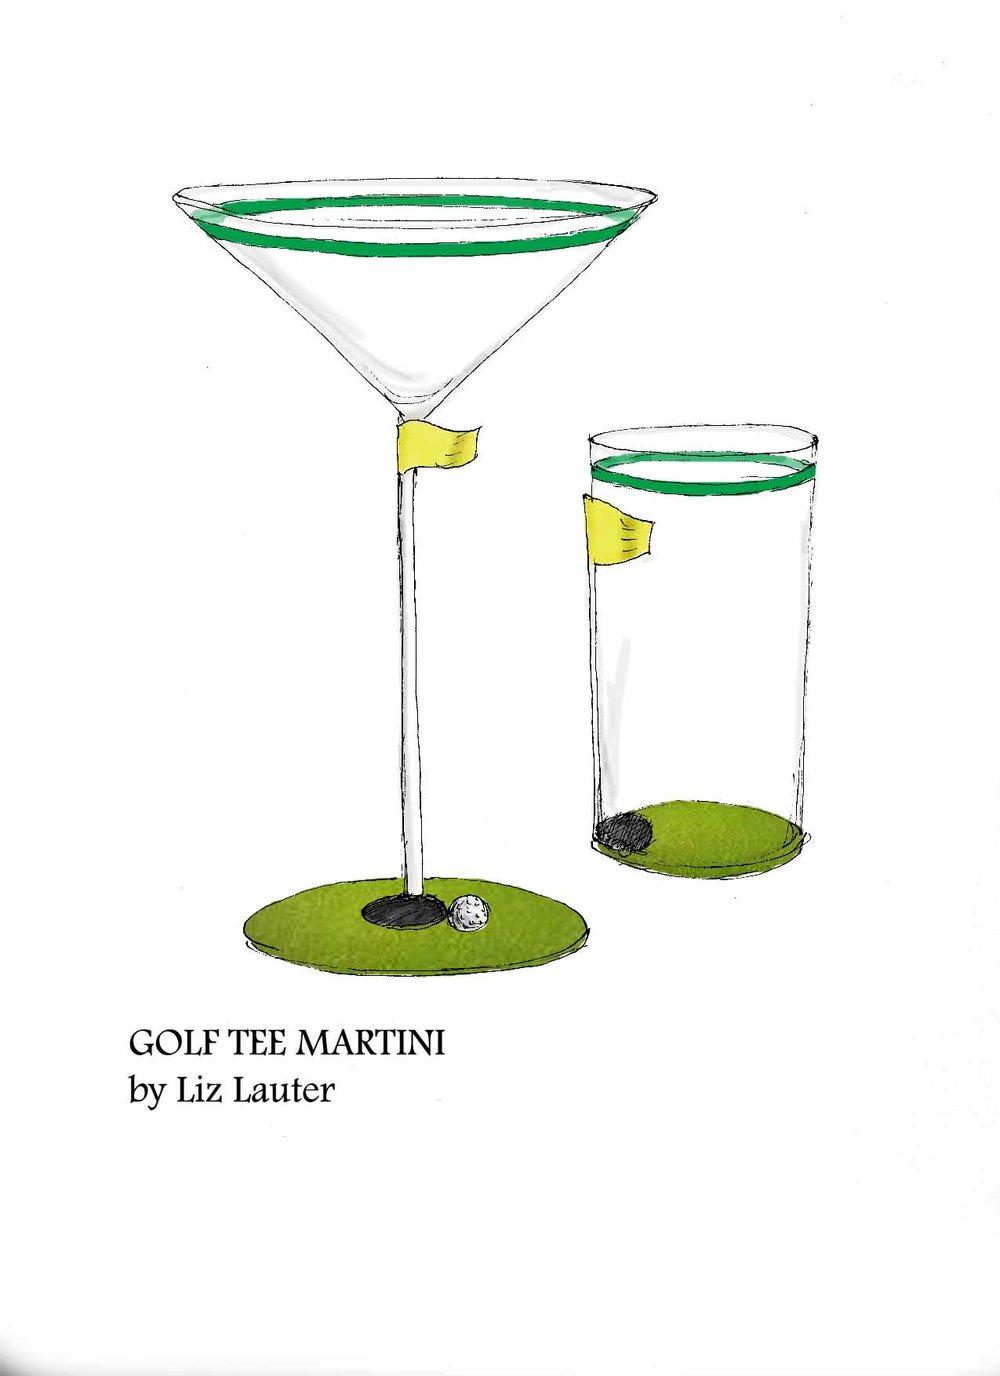 golf tee martini.jpg